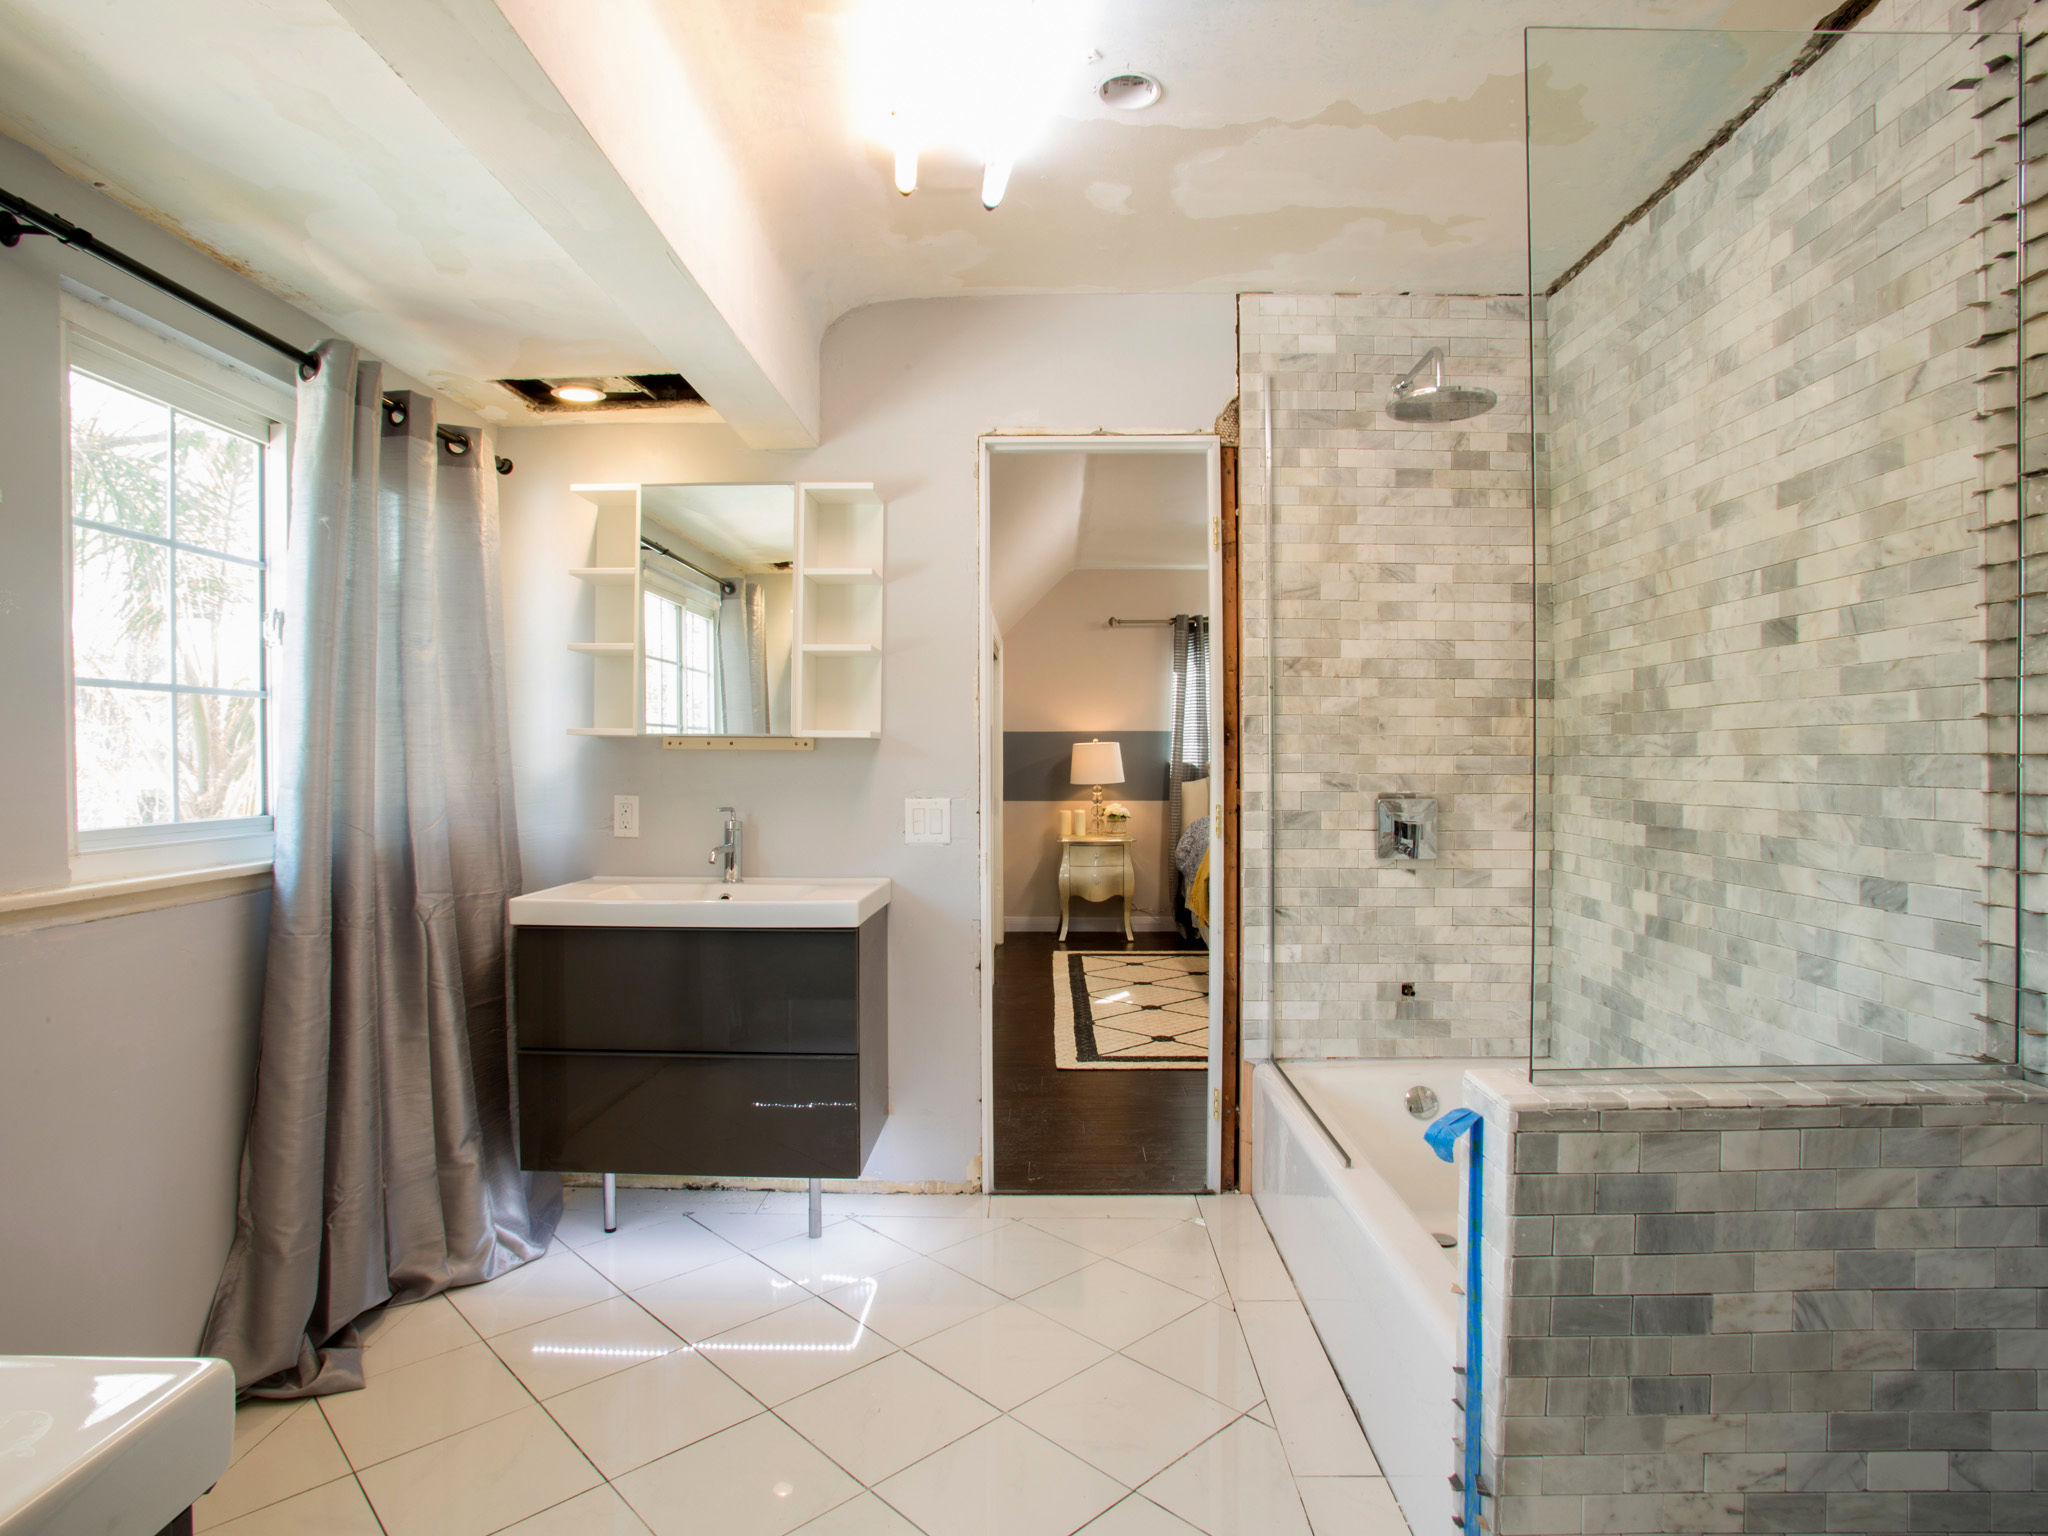 amazing cost to redo a bathroom wallpaper-Sensational Cost to Redo A Bathroom Layout